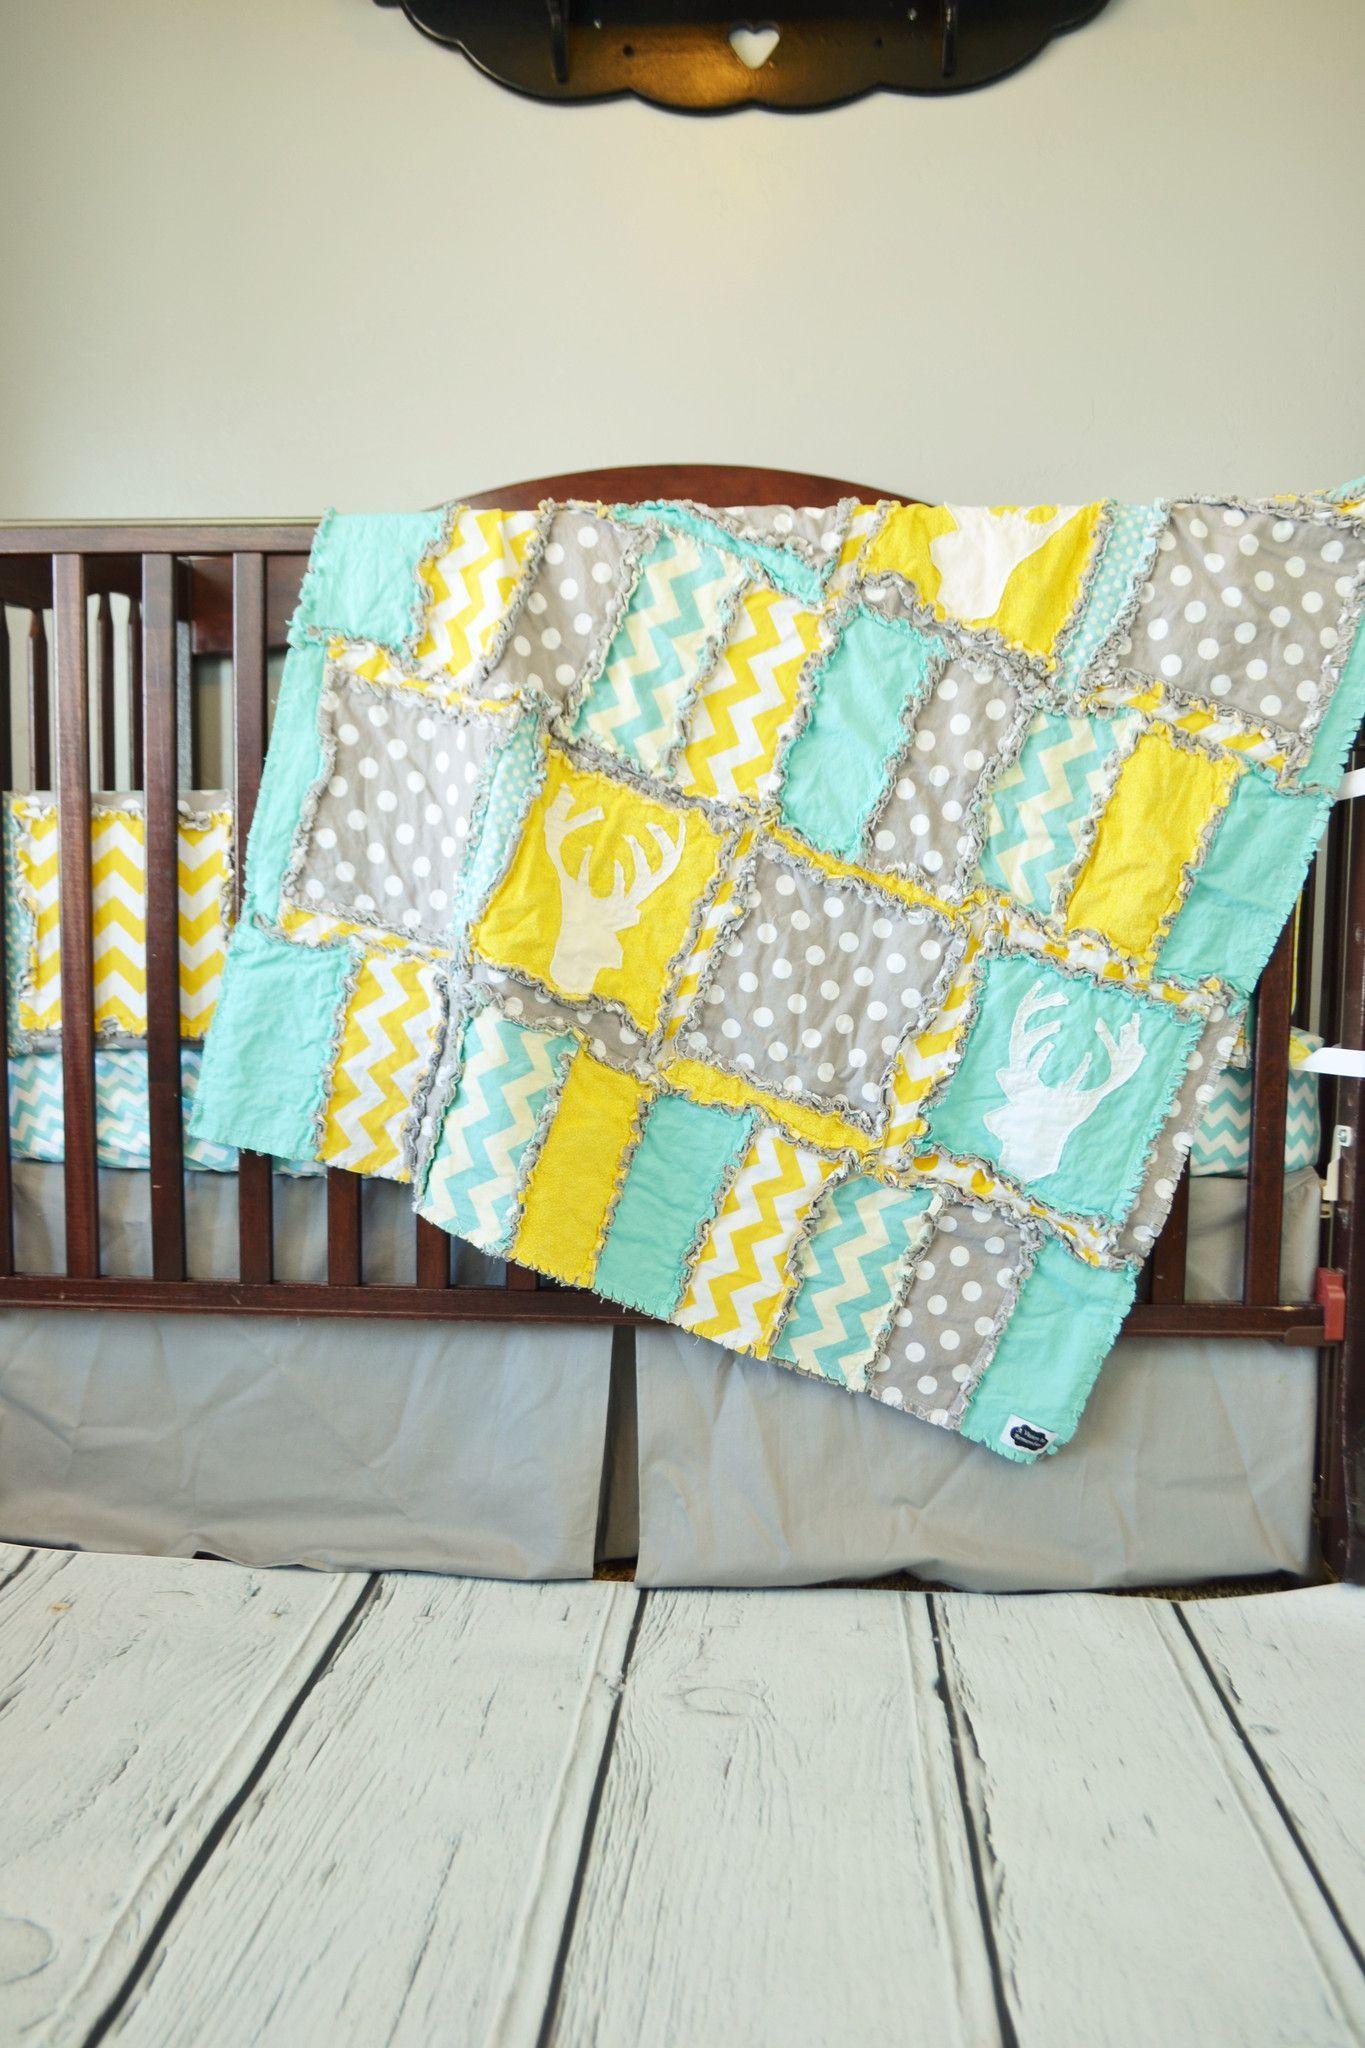 Baby crib yellow - Woodland Baby Crib Bedding For Deer Nursery Yellow Turquoise Gray